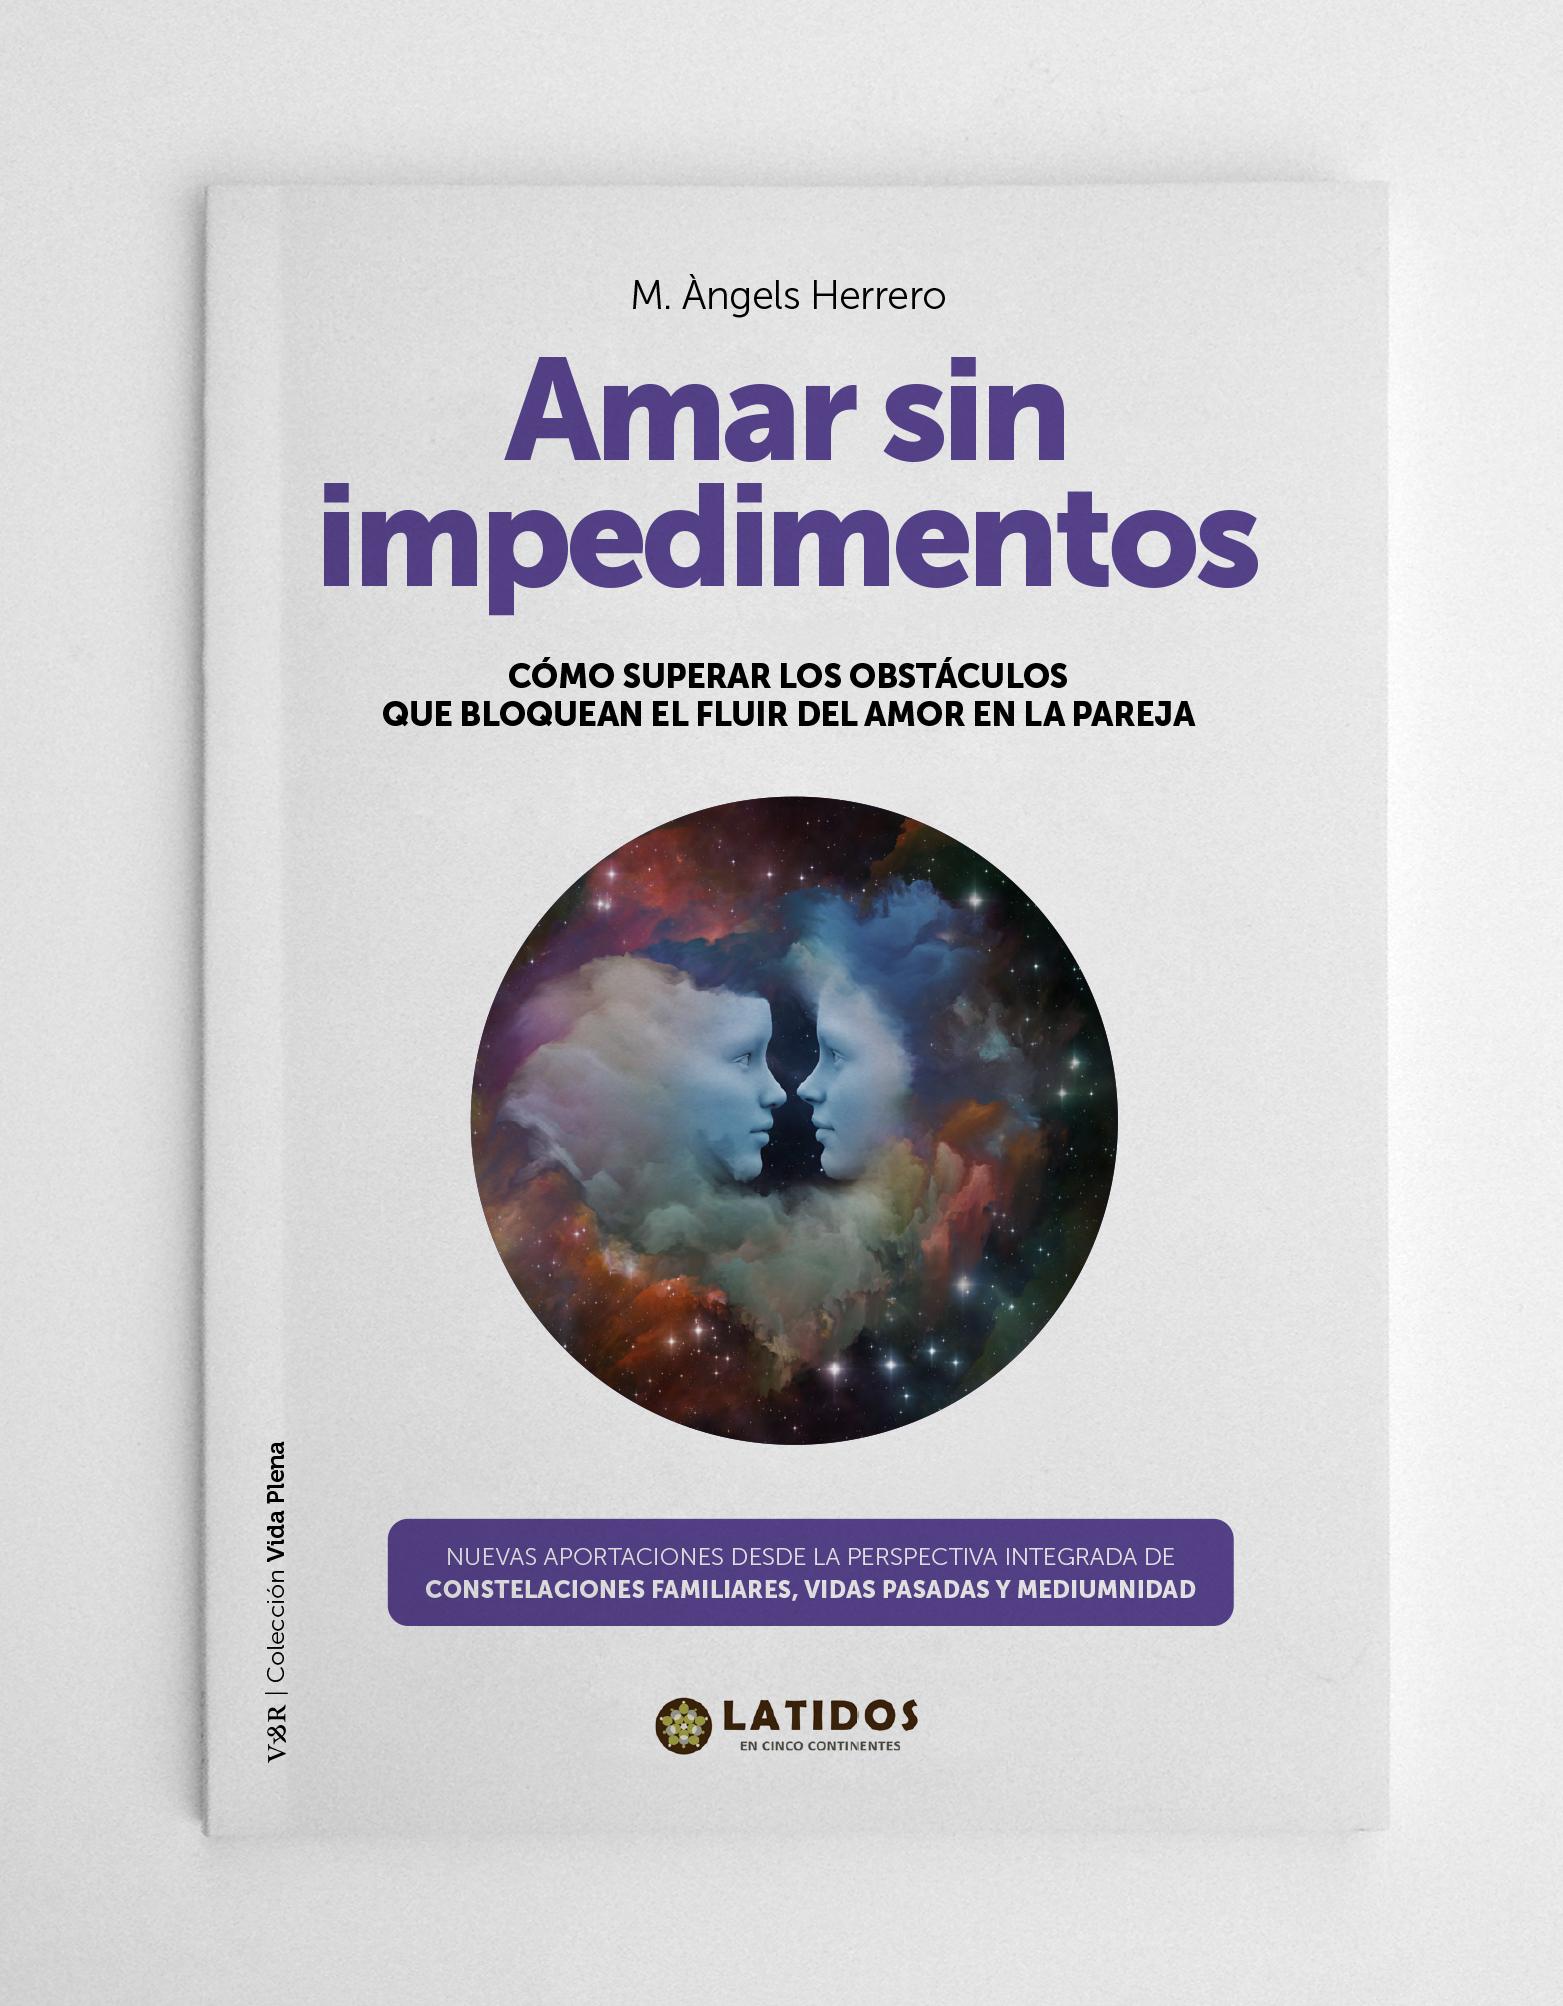 https://services.quares.es/covers/9000100216289.jpg